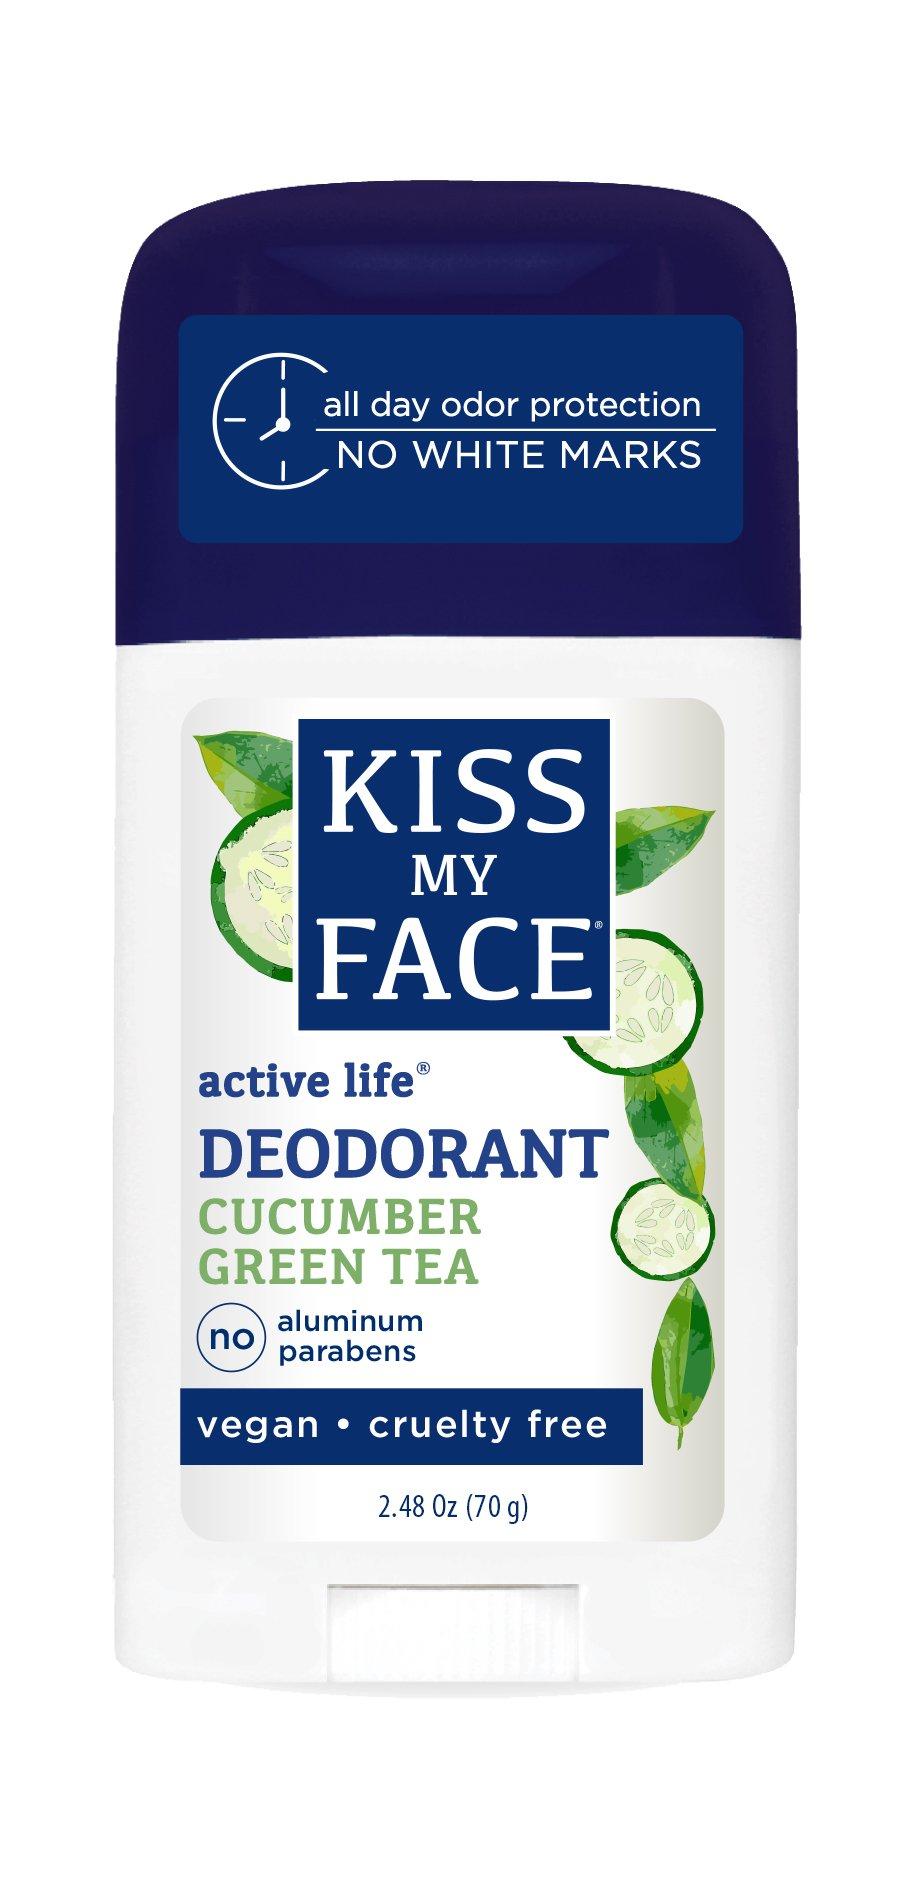 Kiss My Face Active Life Aluminum CHLOROHYDRATE Free Deodorant, Cucumber Green Tea, 2.48 Ounce Stick